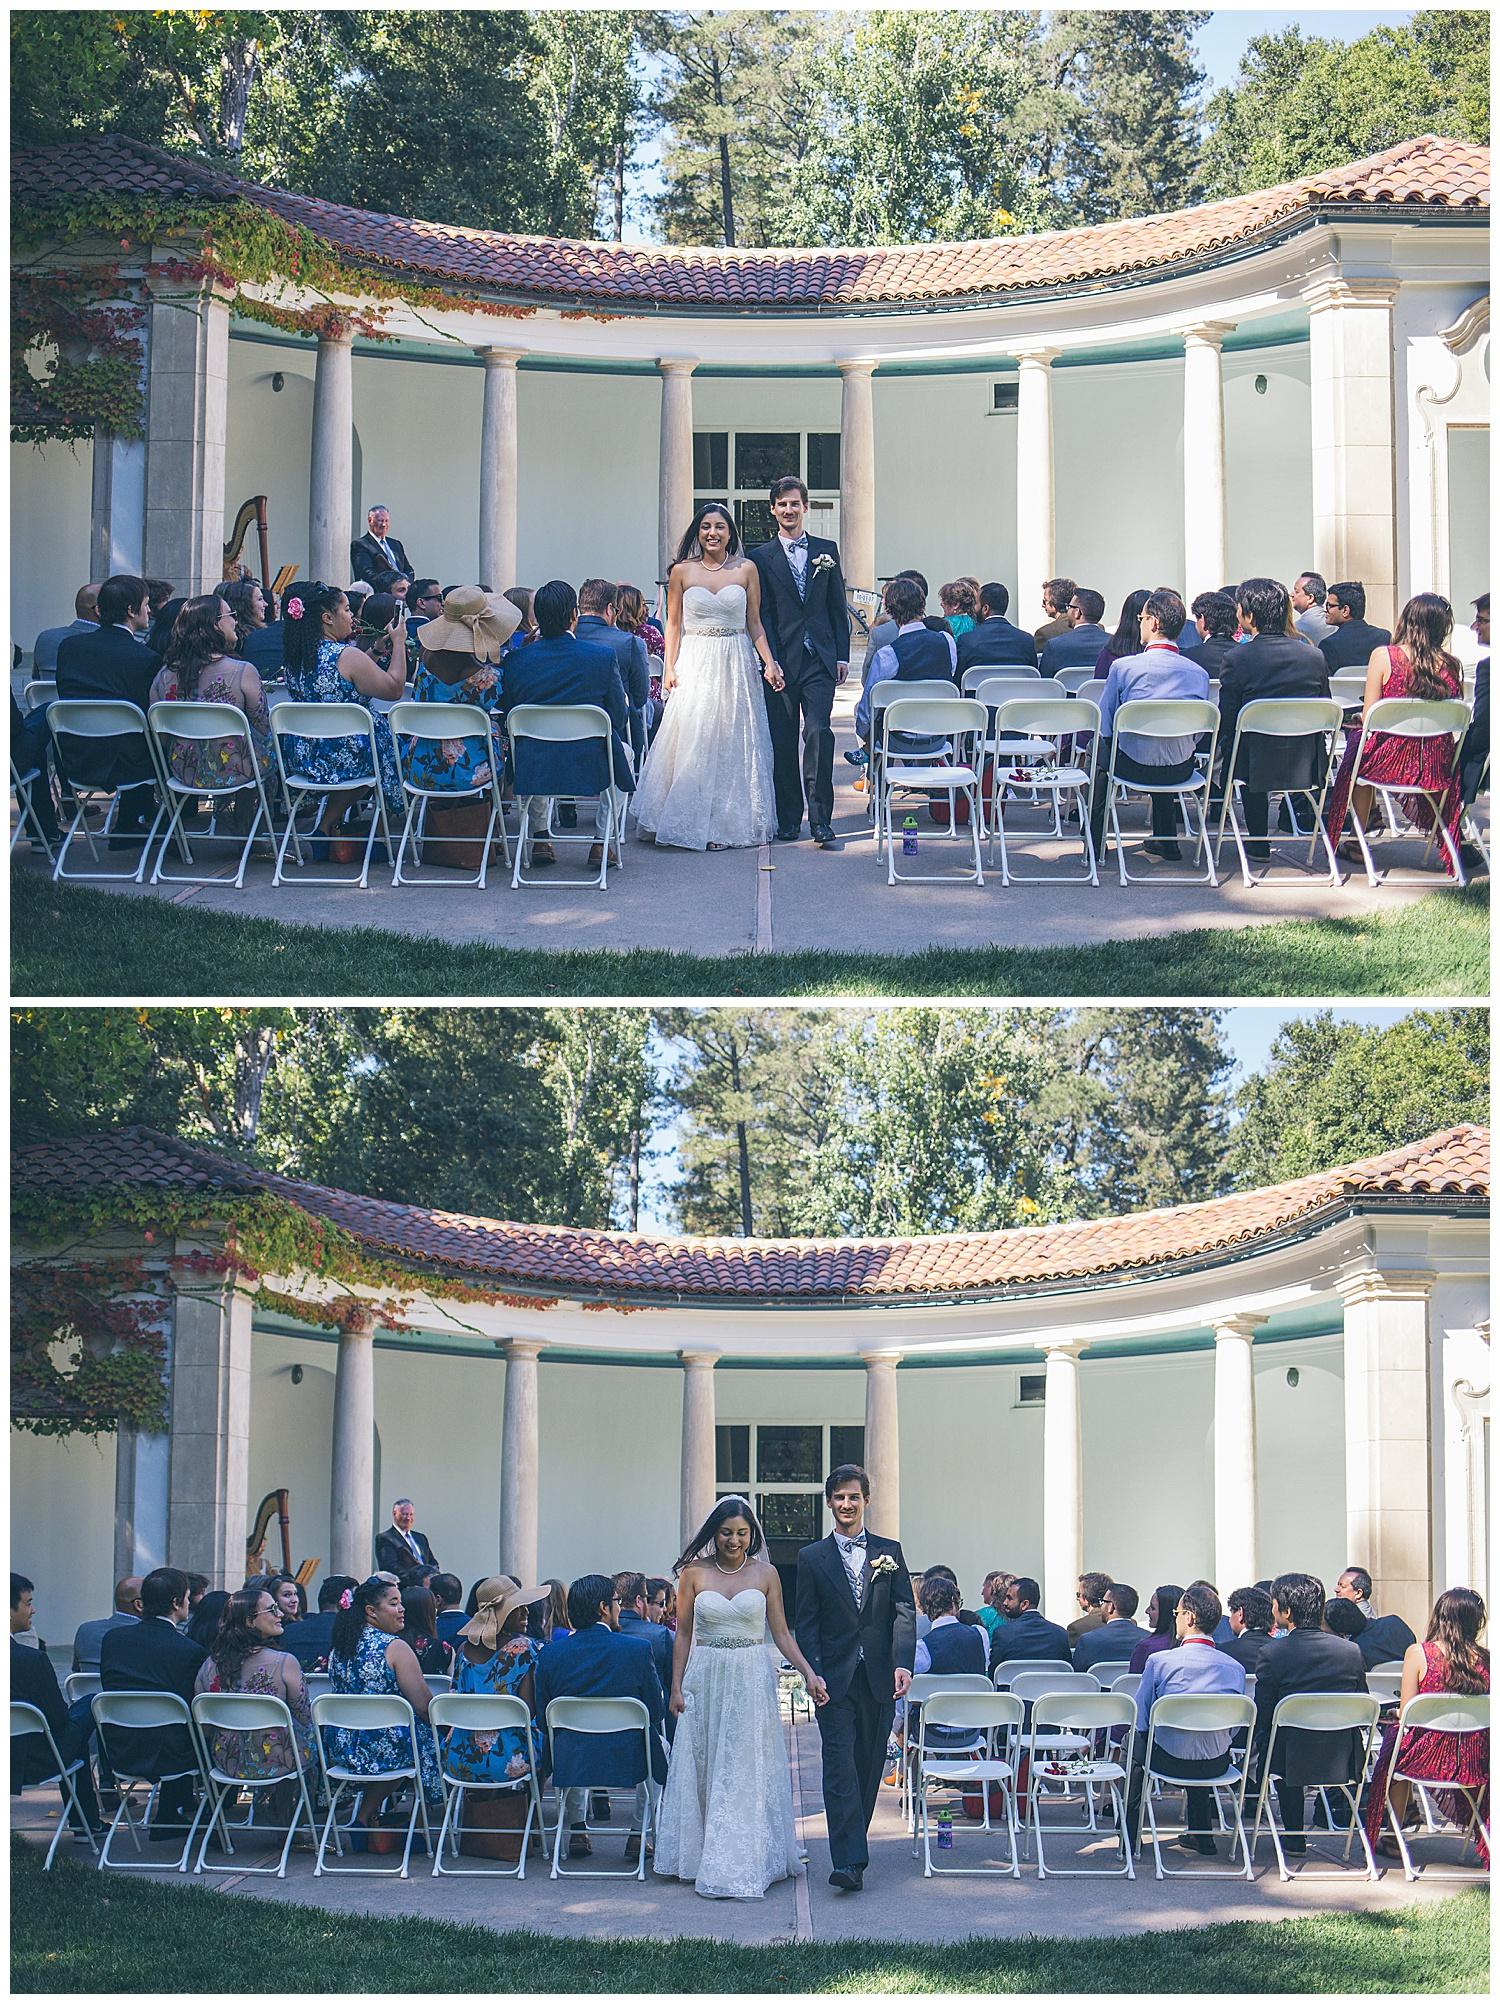 khariza-rae-photography-bay-area-wedding-photographer_0149.jpg